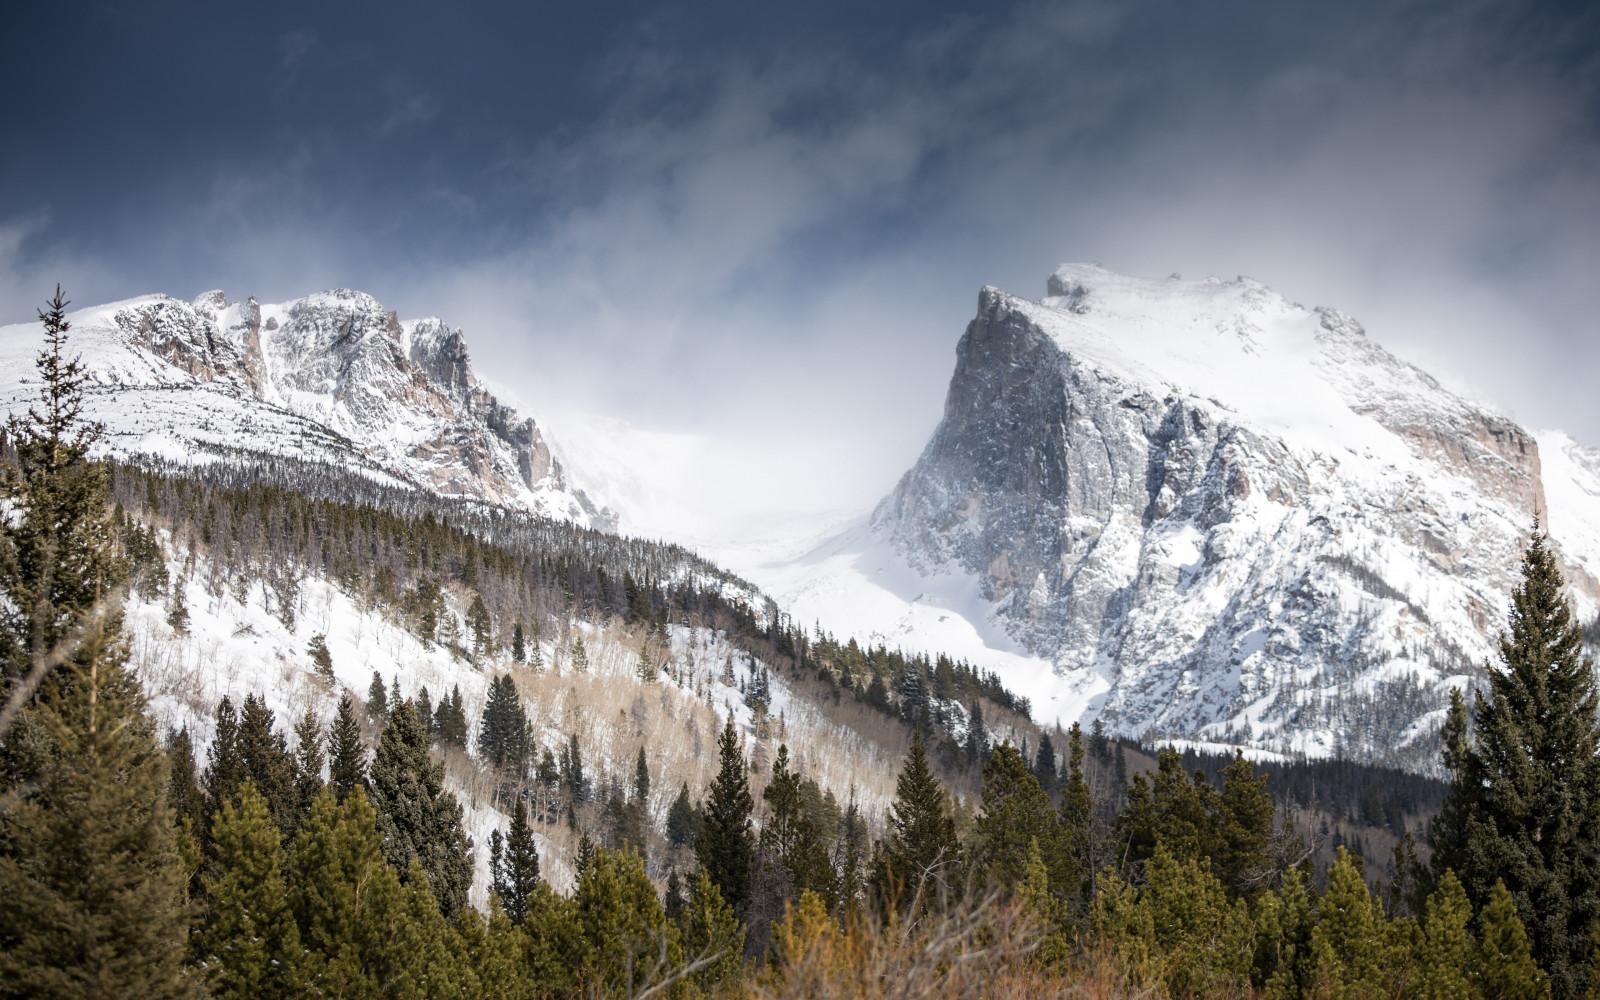 Wallpaper landscape forest nature snow winter mountain pass wilderness alps summit - 5120x3200 resolution ...